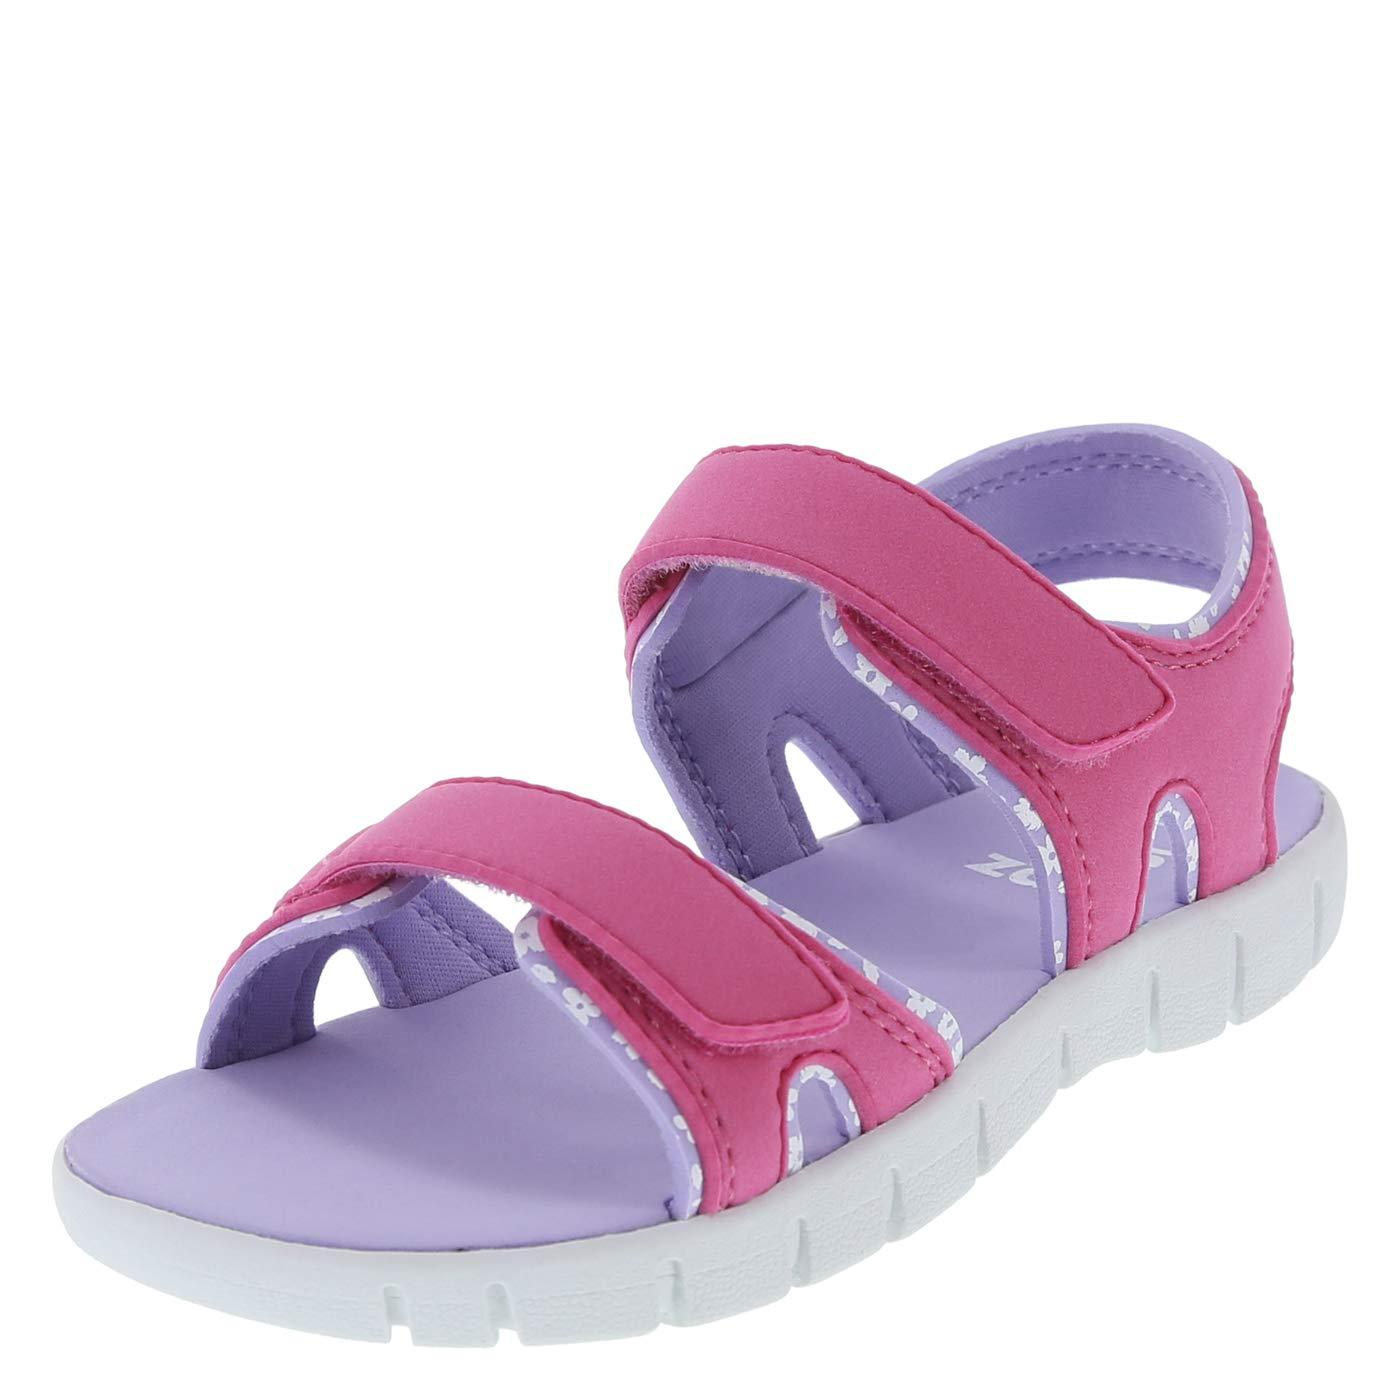 Zoe and Zac Girls' Parker Double Strap Sport Sandal 079490-Parent